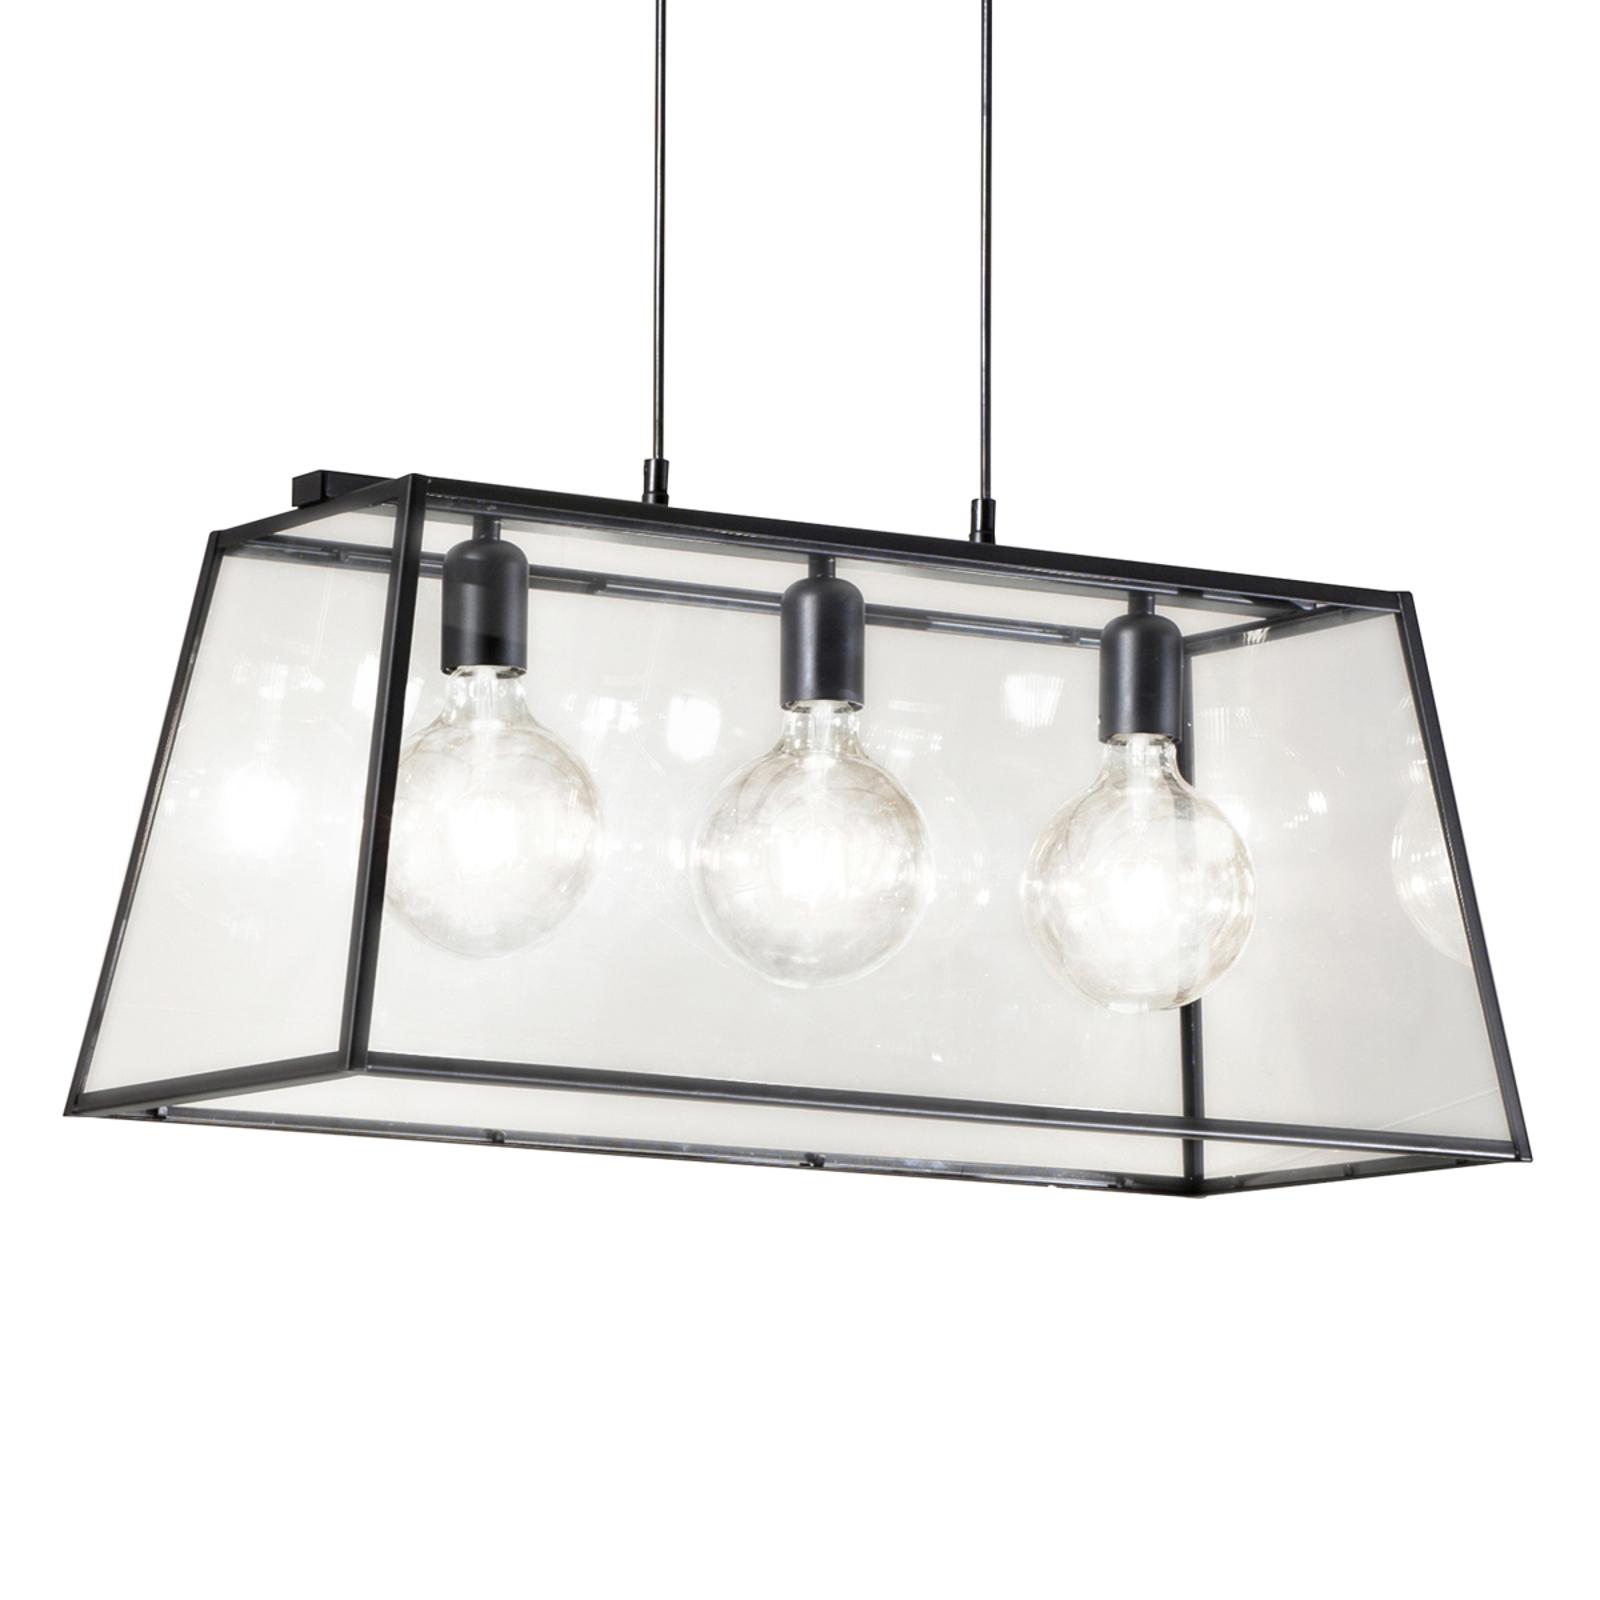 Hanglamp Troja, 70 cm, 3-lamps